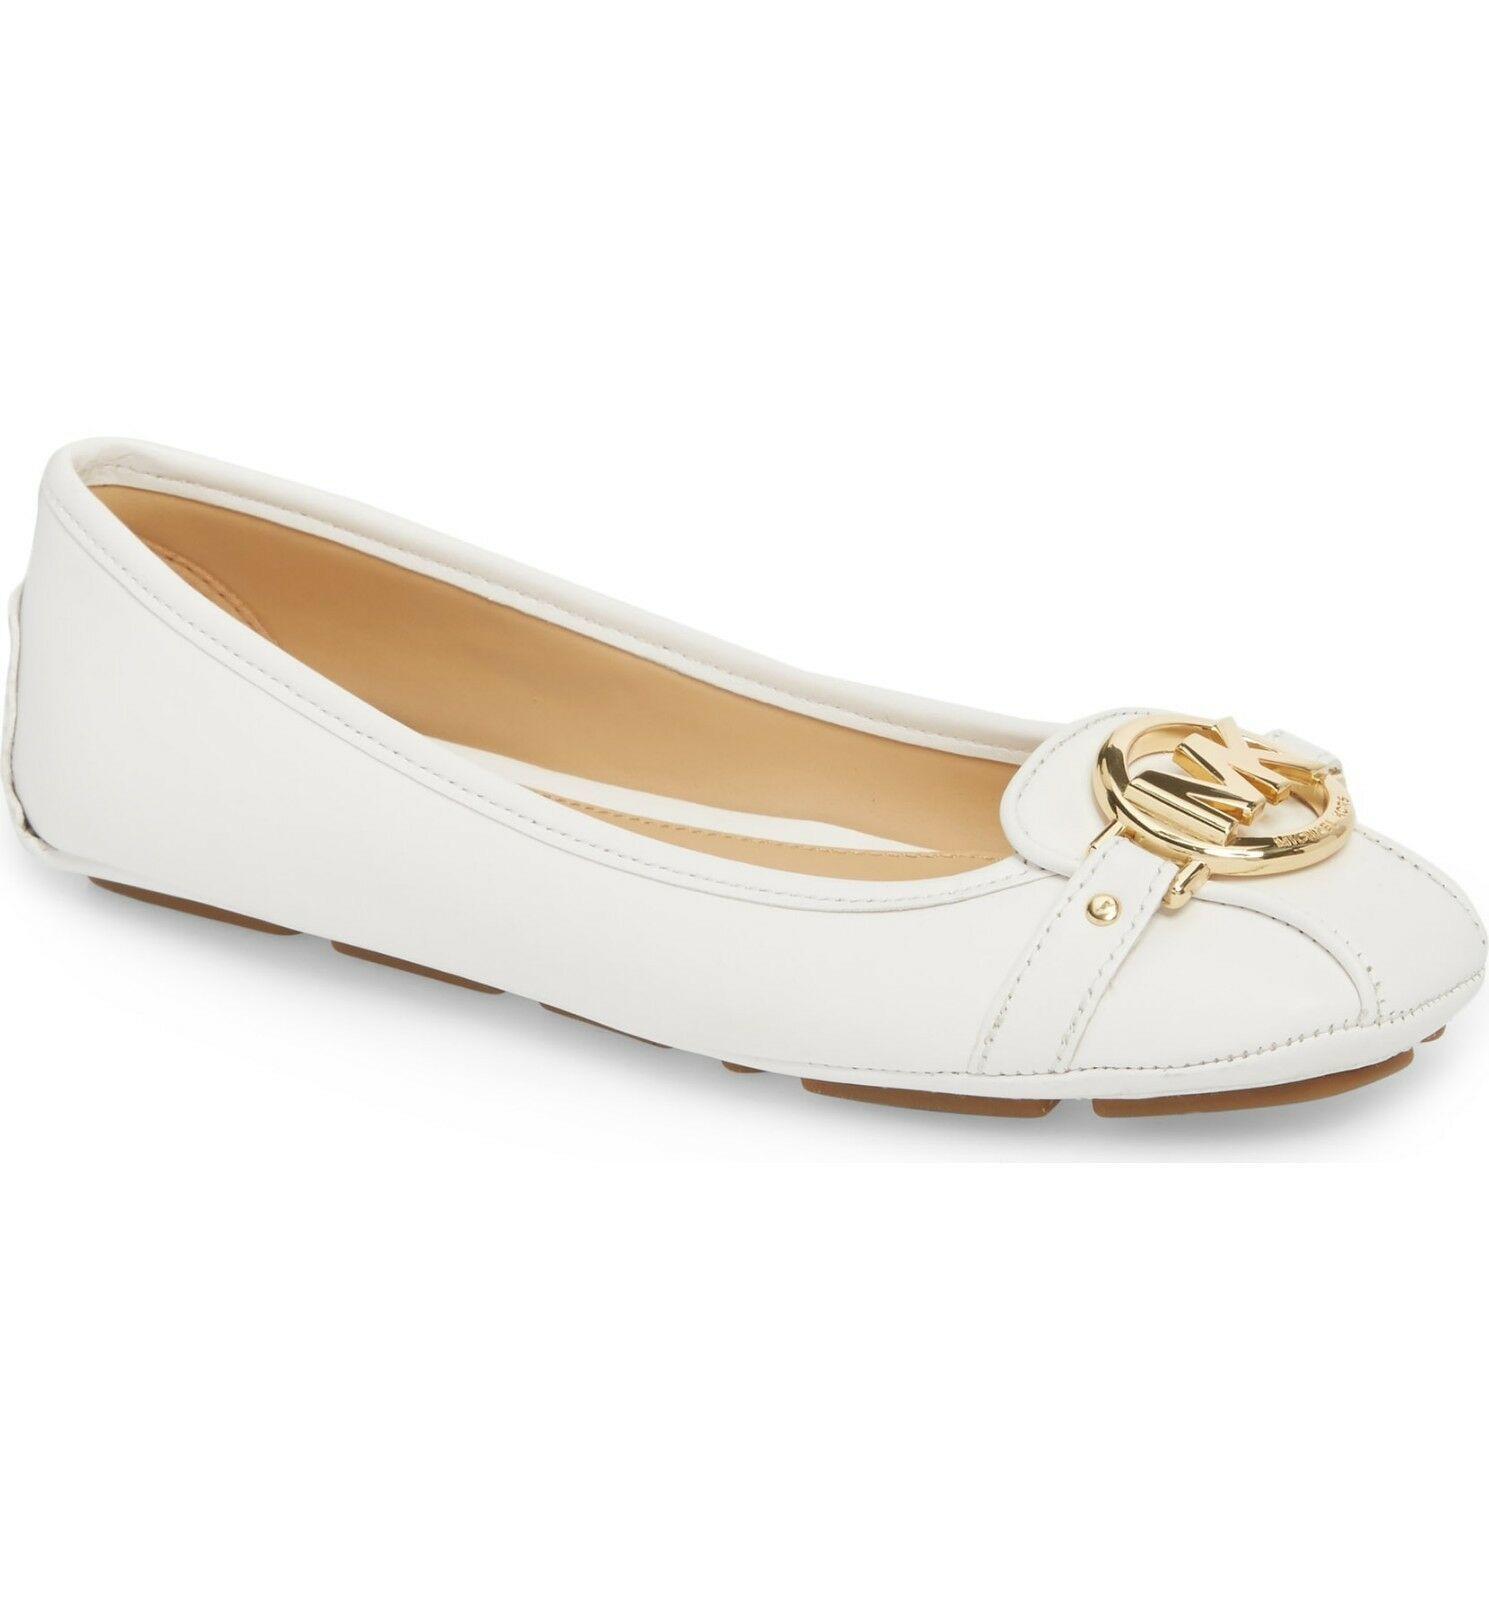 Michael Kors MK Women's Premium Designer Fulton Moccasin Flats Optic White